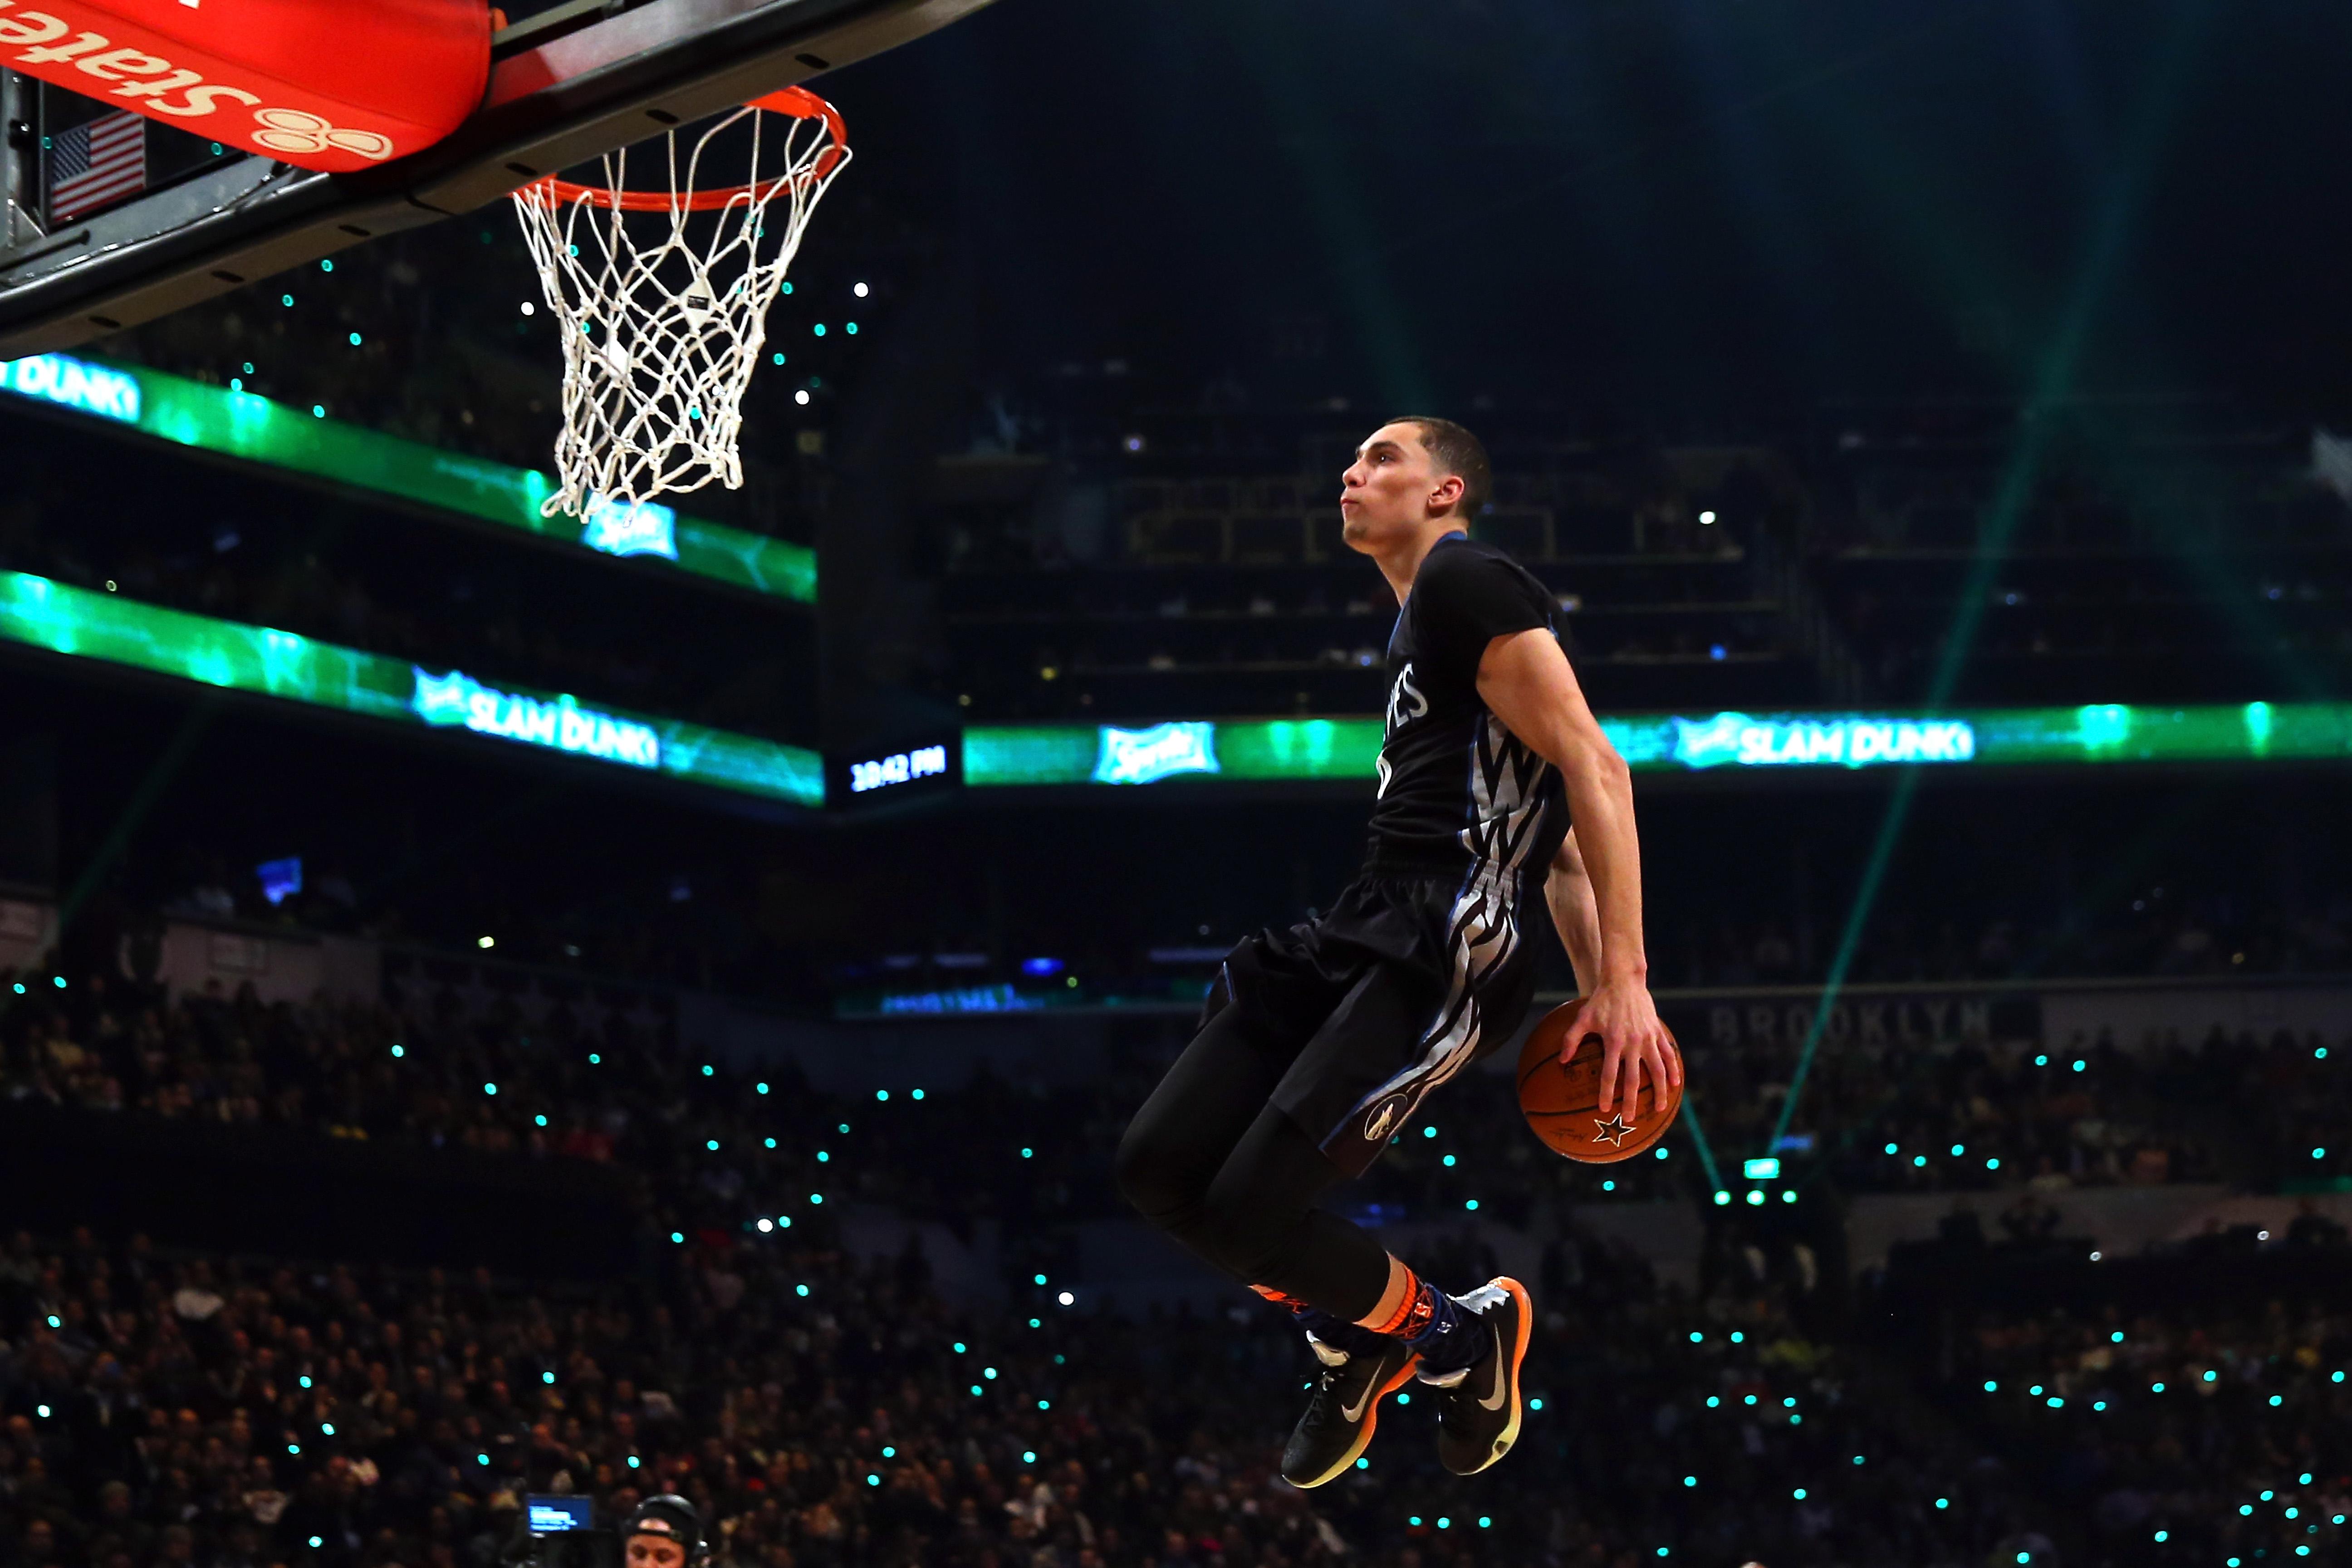 Watch all of Zach LaVines NBA Dunk Contest tries SIcom 5184x3456